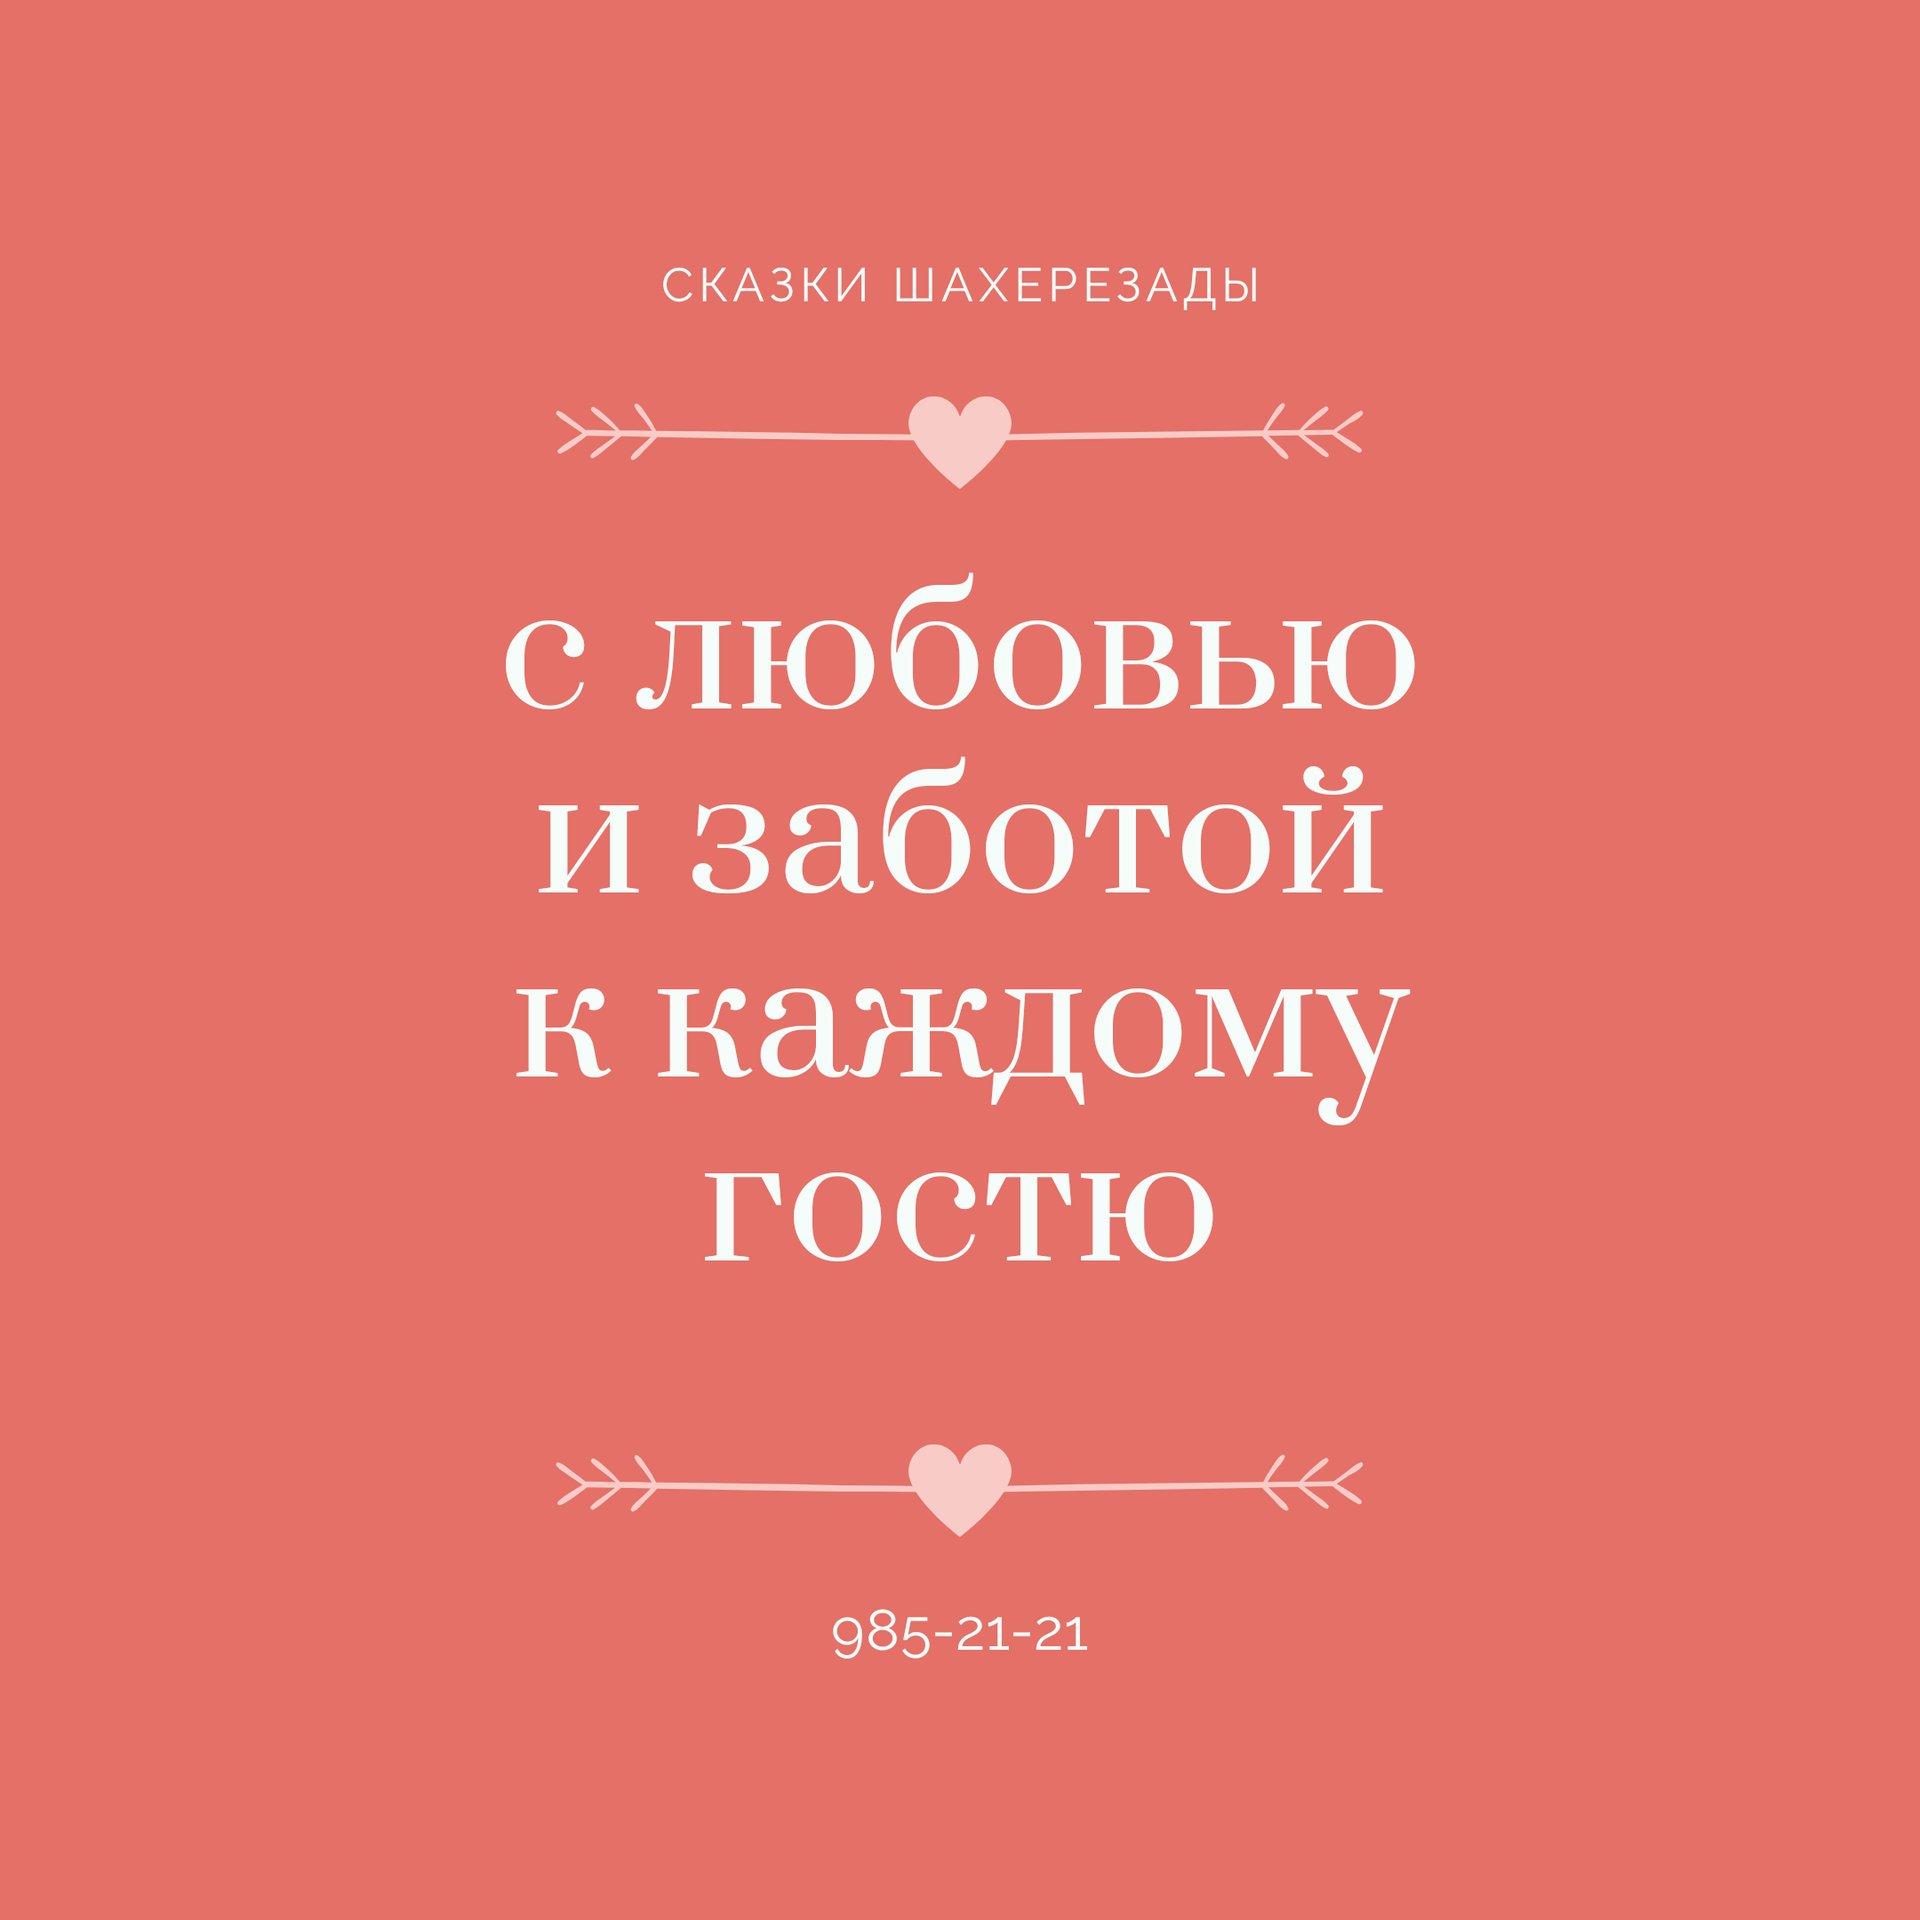 Ресторан «Сказки Шахерезады» - Вконтакте